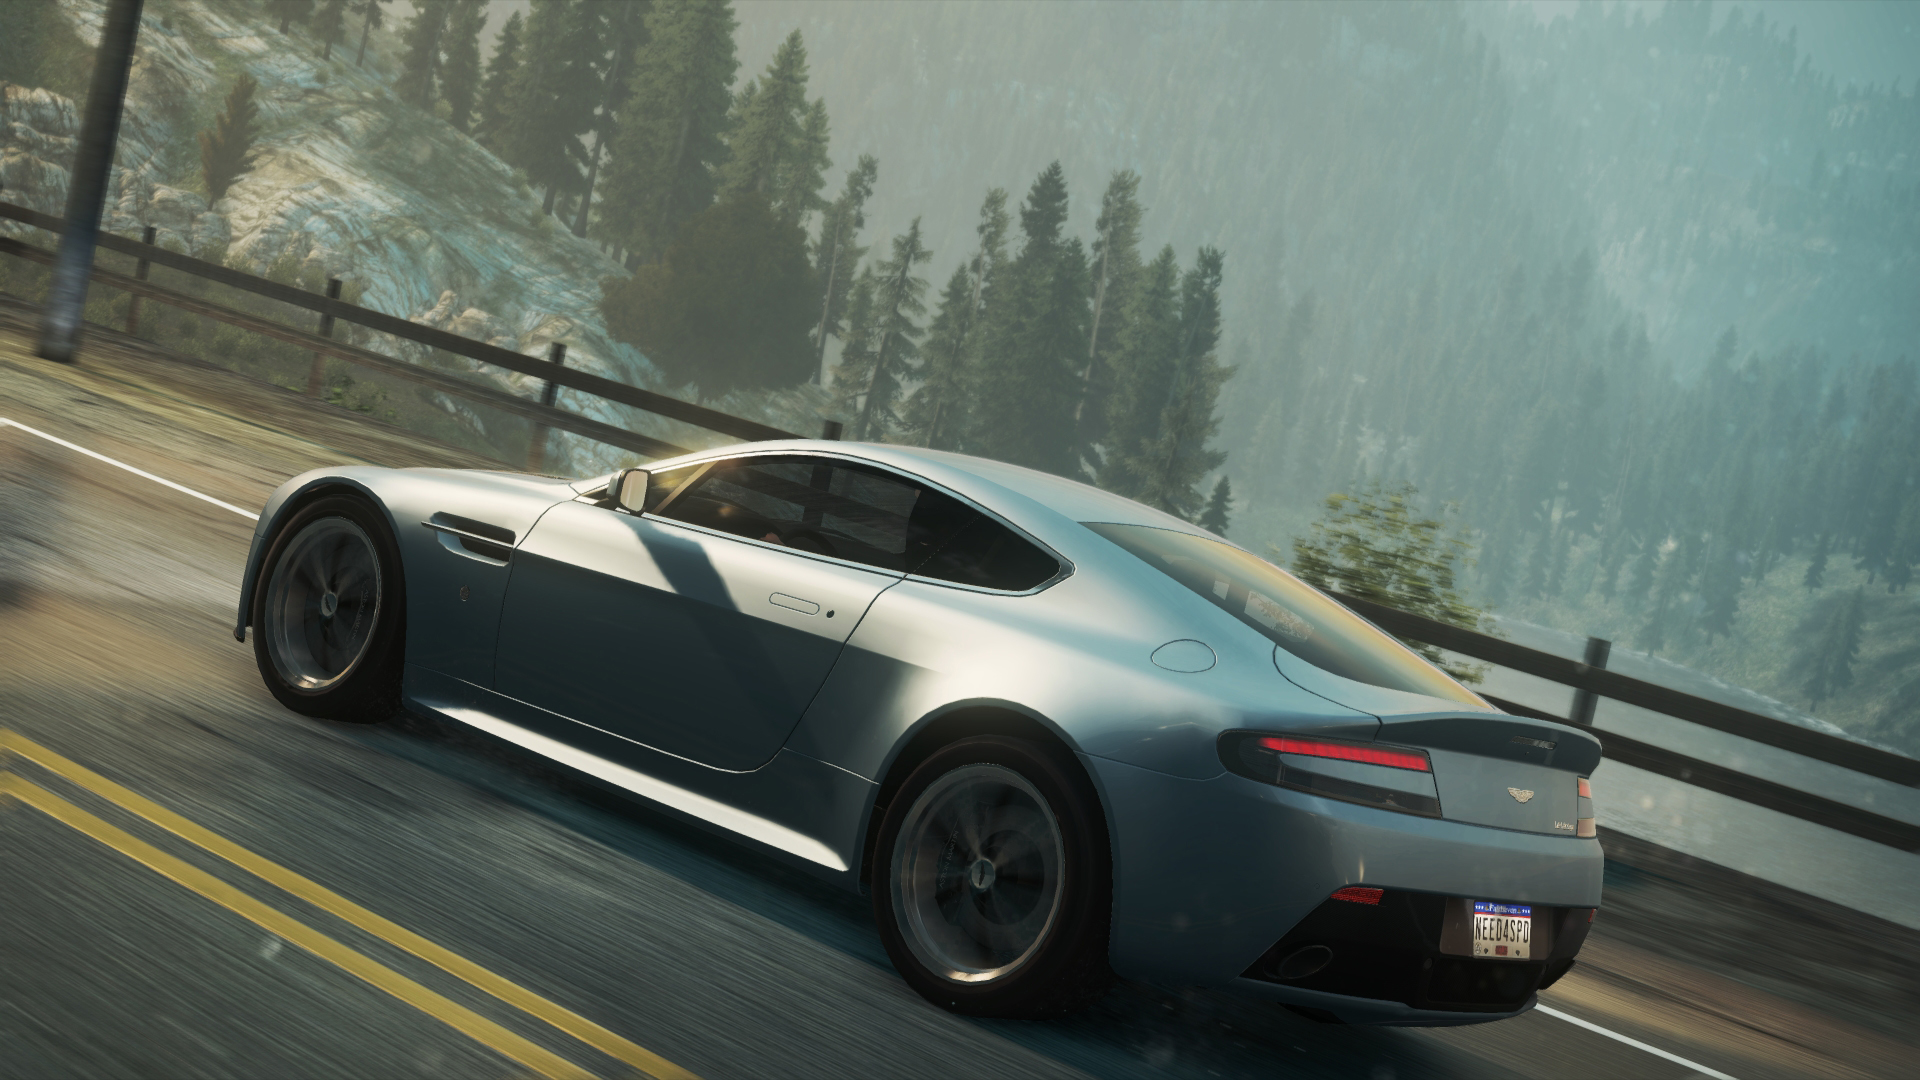 Aston Martin V12 Vantage Need For Speed Wiki Fandom